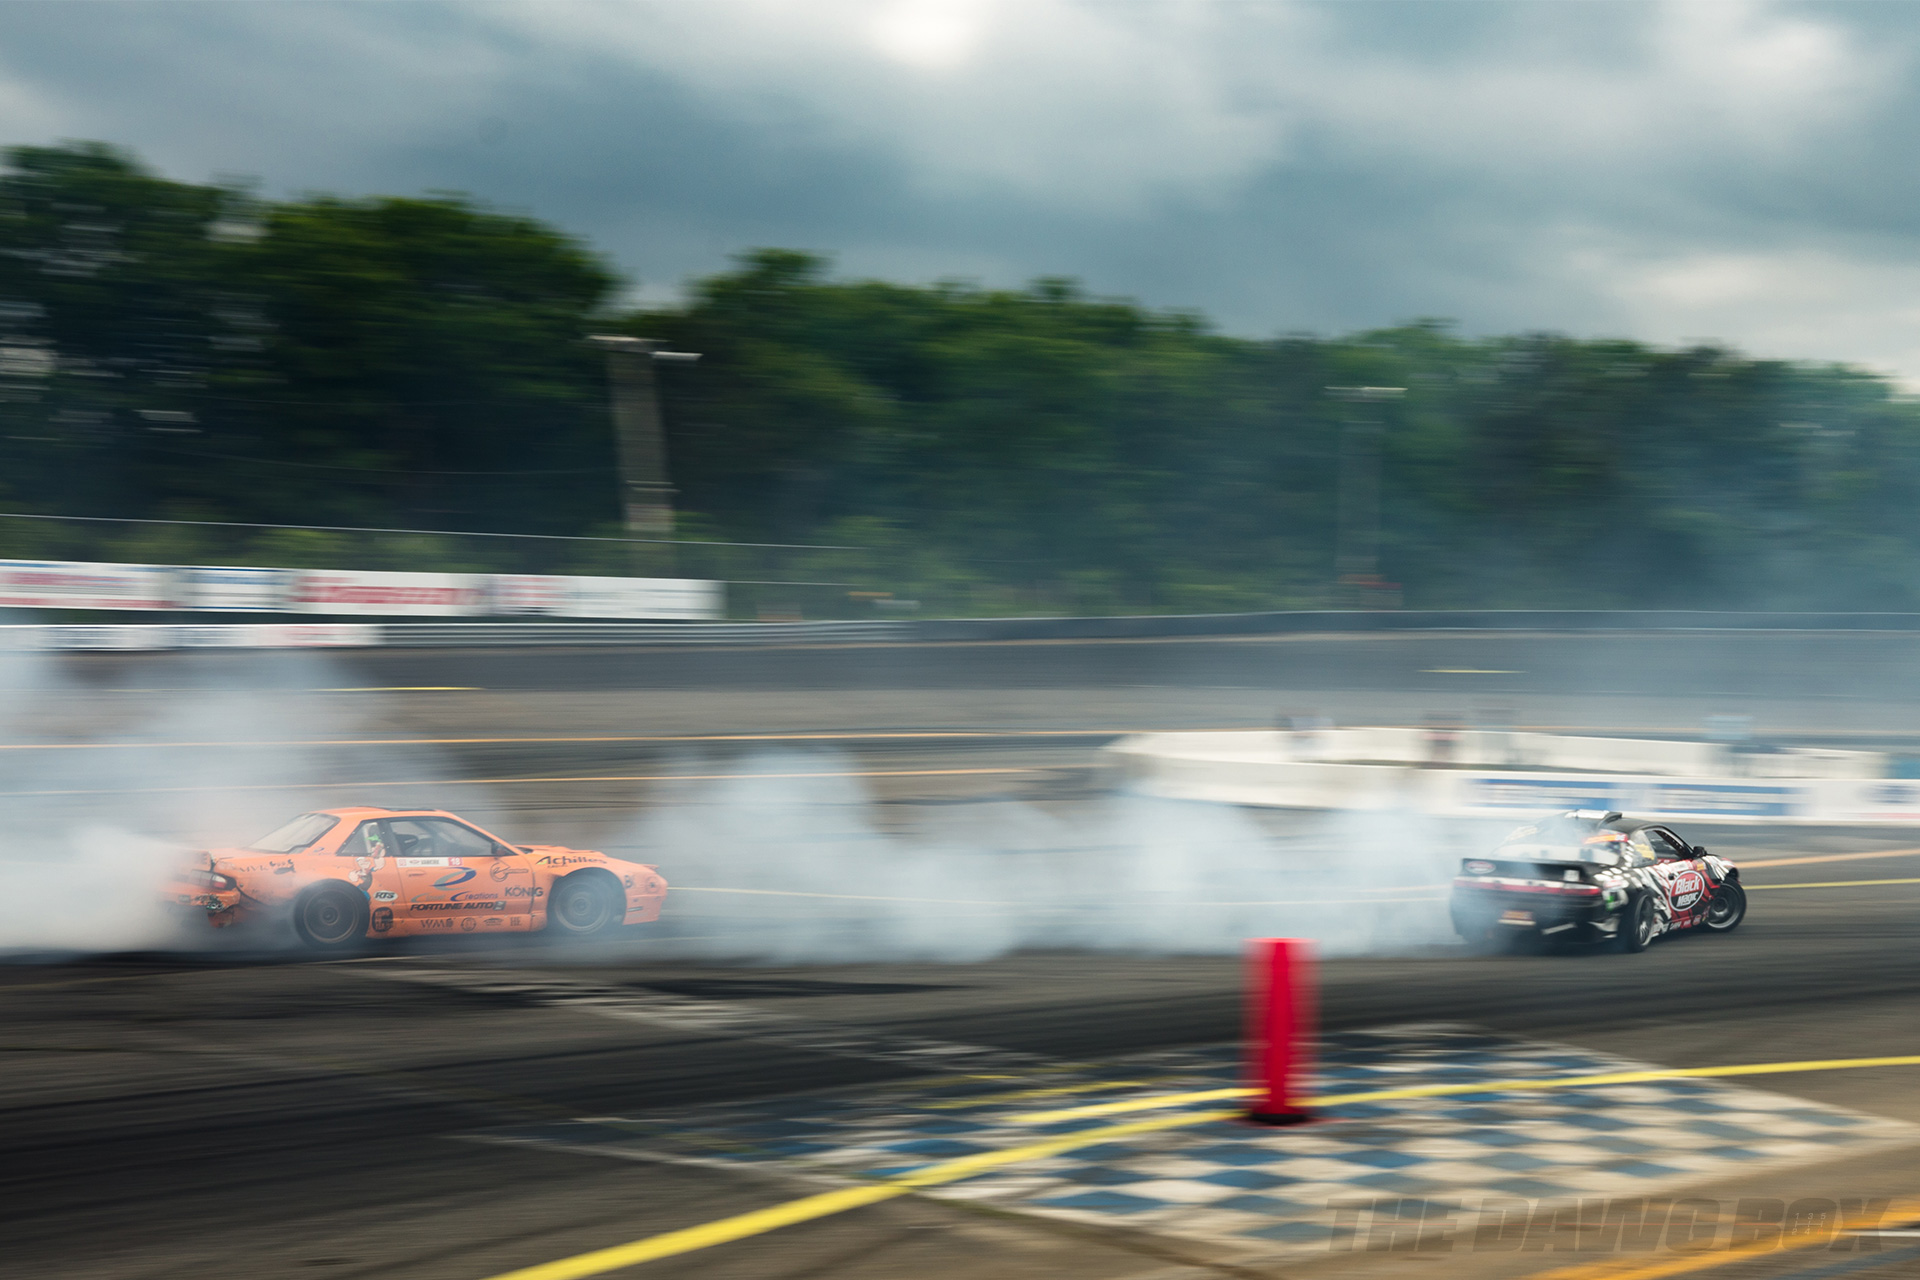 Nissan S13's tandem drifting